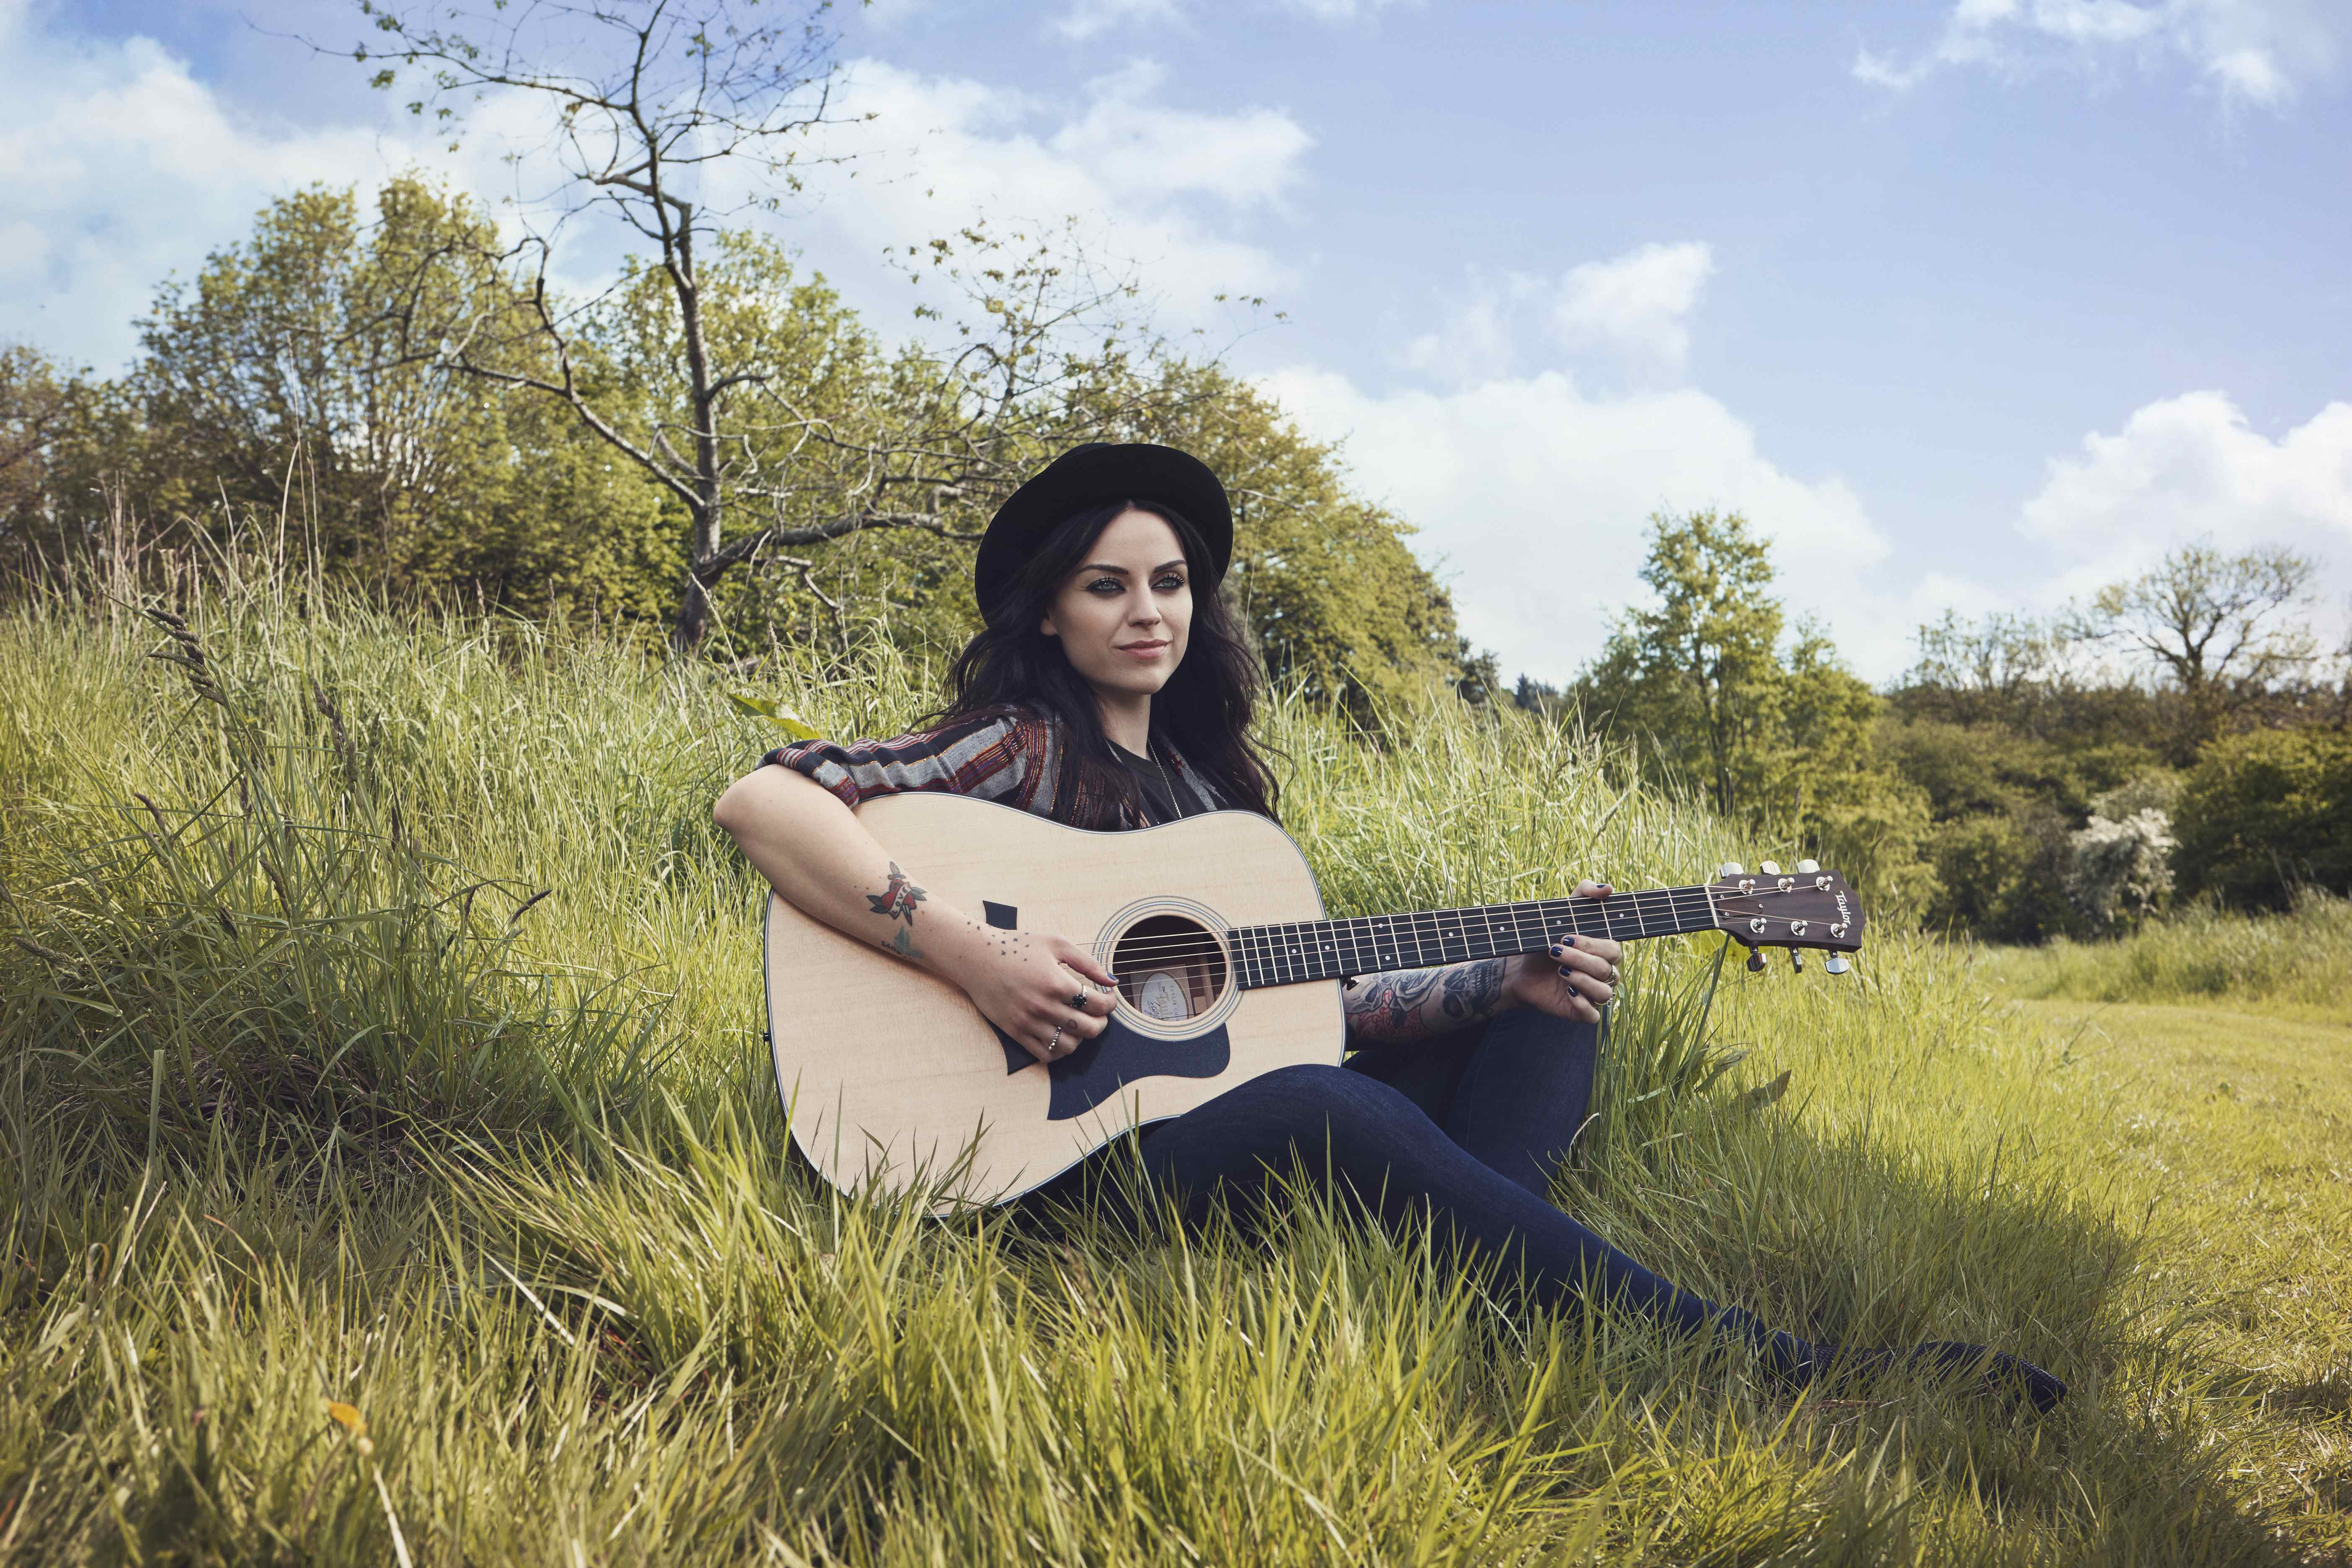 Rudolstadt-Festival: Amy Macdonald eröffnet Deutschlands größtes Festival für Weltmusik